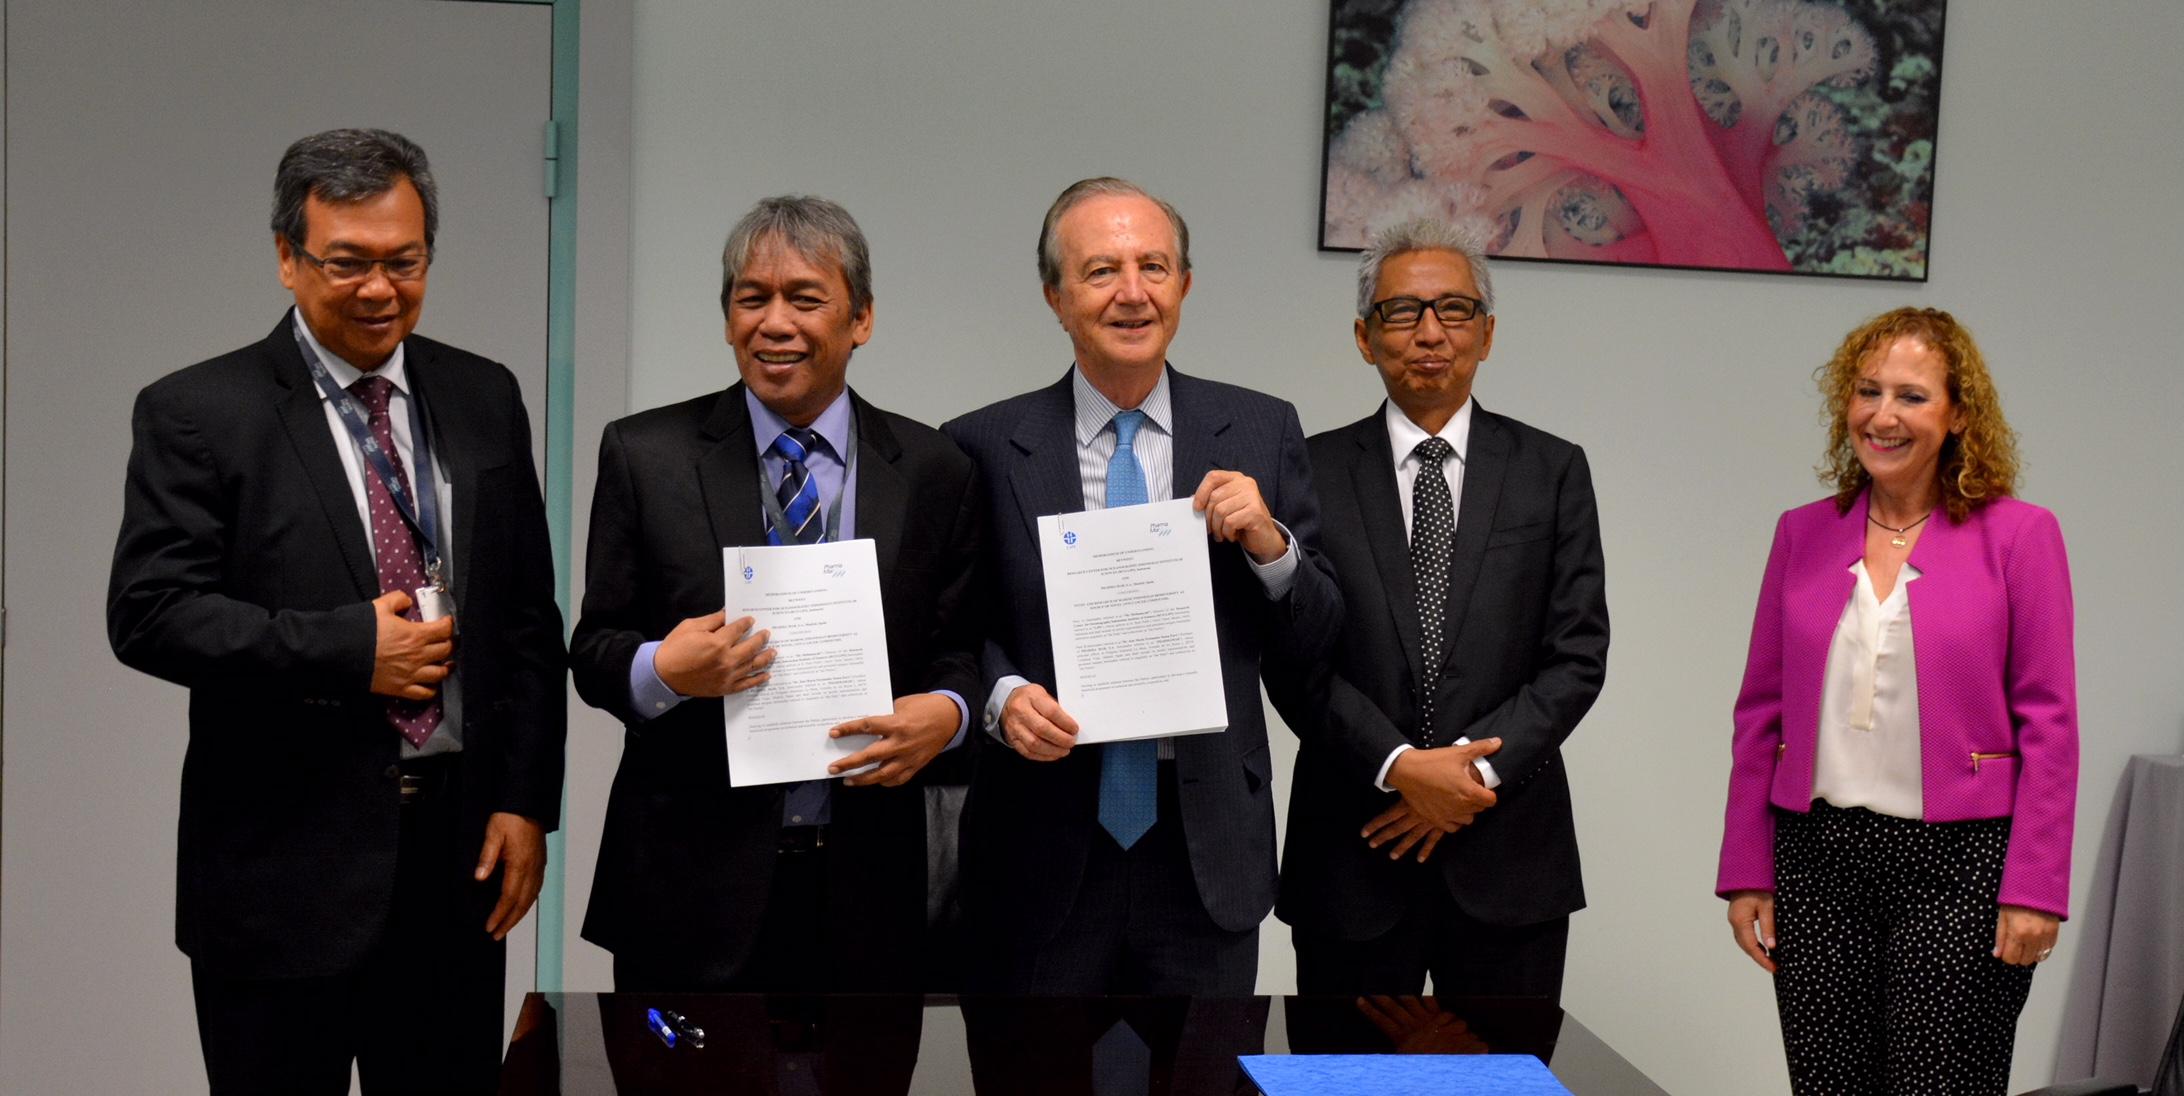 Pharma Mar acurdo con centro de Indonesia para estudio antitumoral